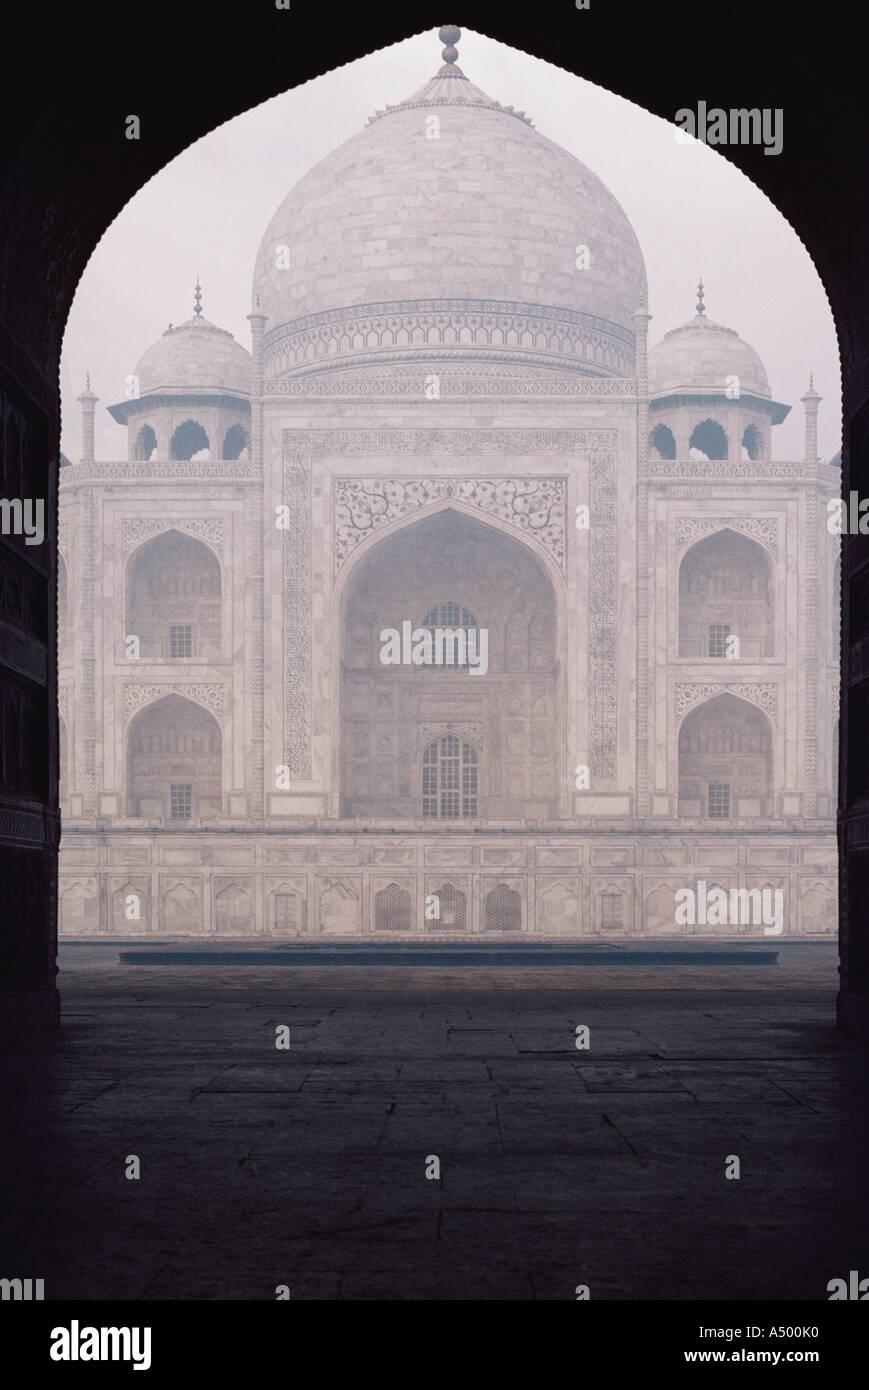 Taj Mahal seen through arch - Stock Image